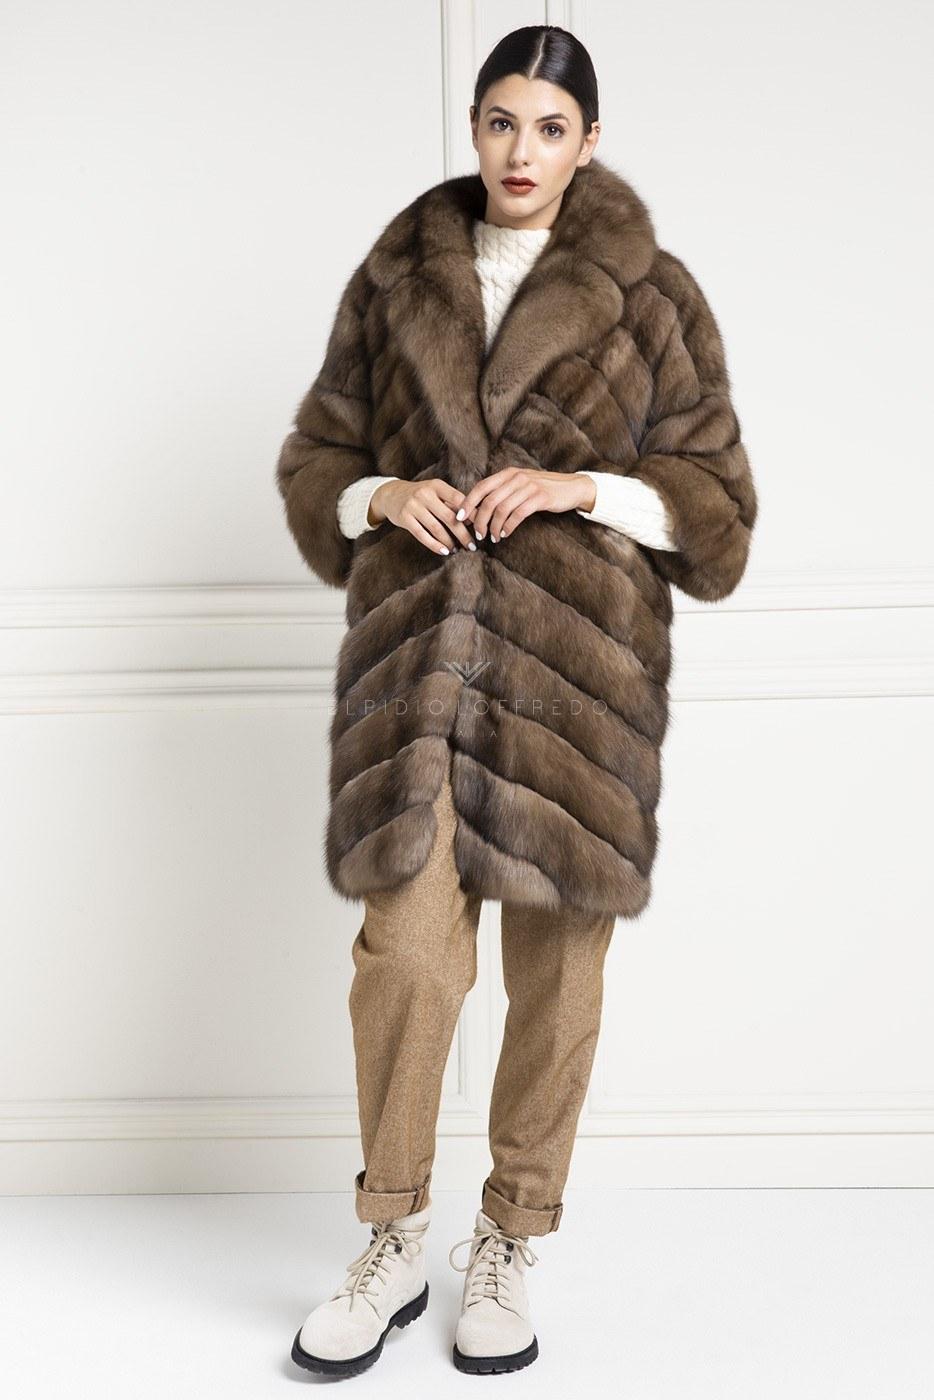 Barguzinsky Russian Sable Fur - Titanio Color - Length 90 cm